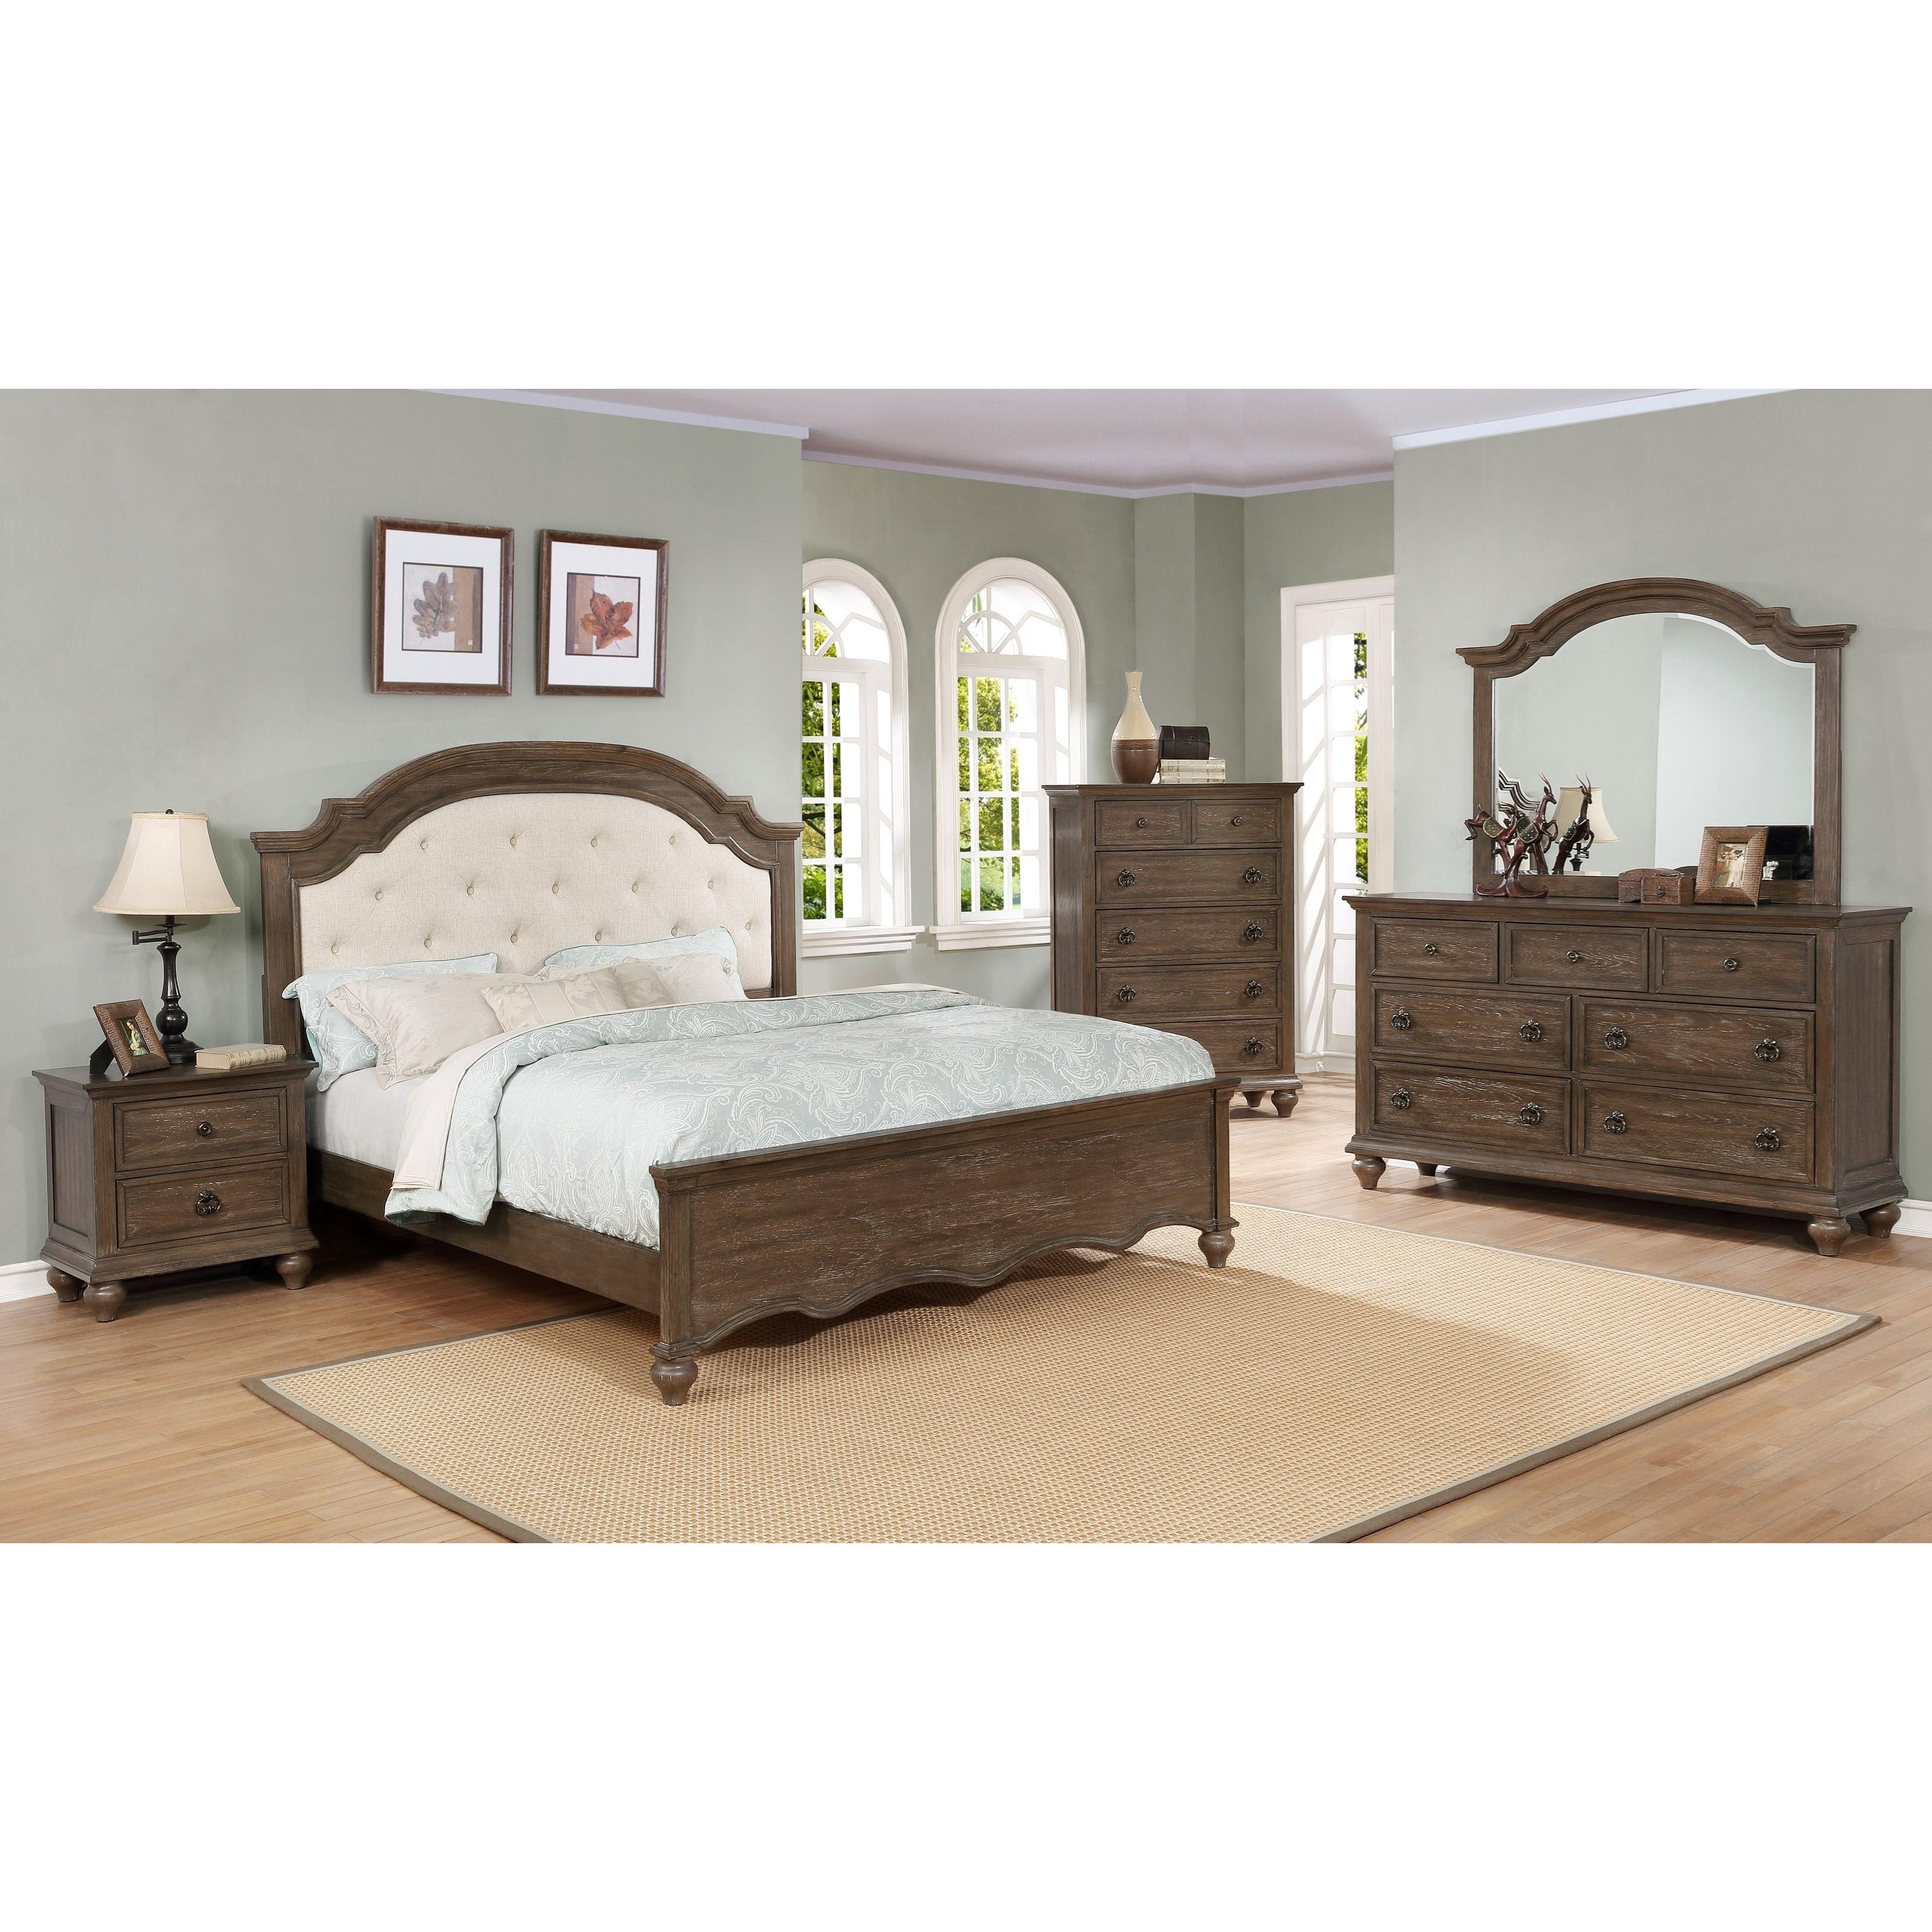 Crown Mark Farrow Queen Bedroom Group: Crown Mark Tafton King Bedroom Group